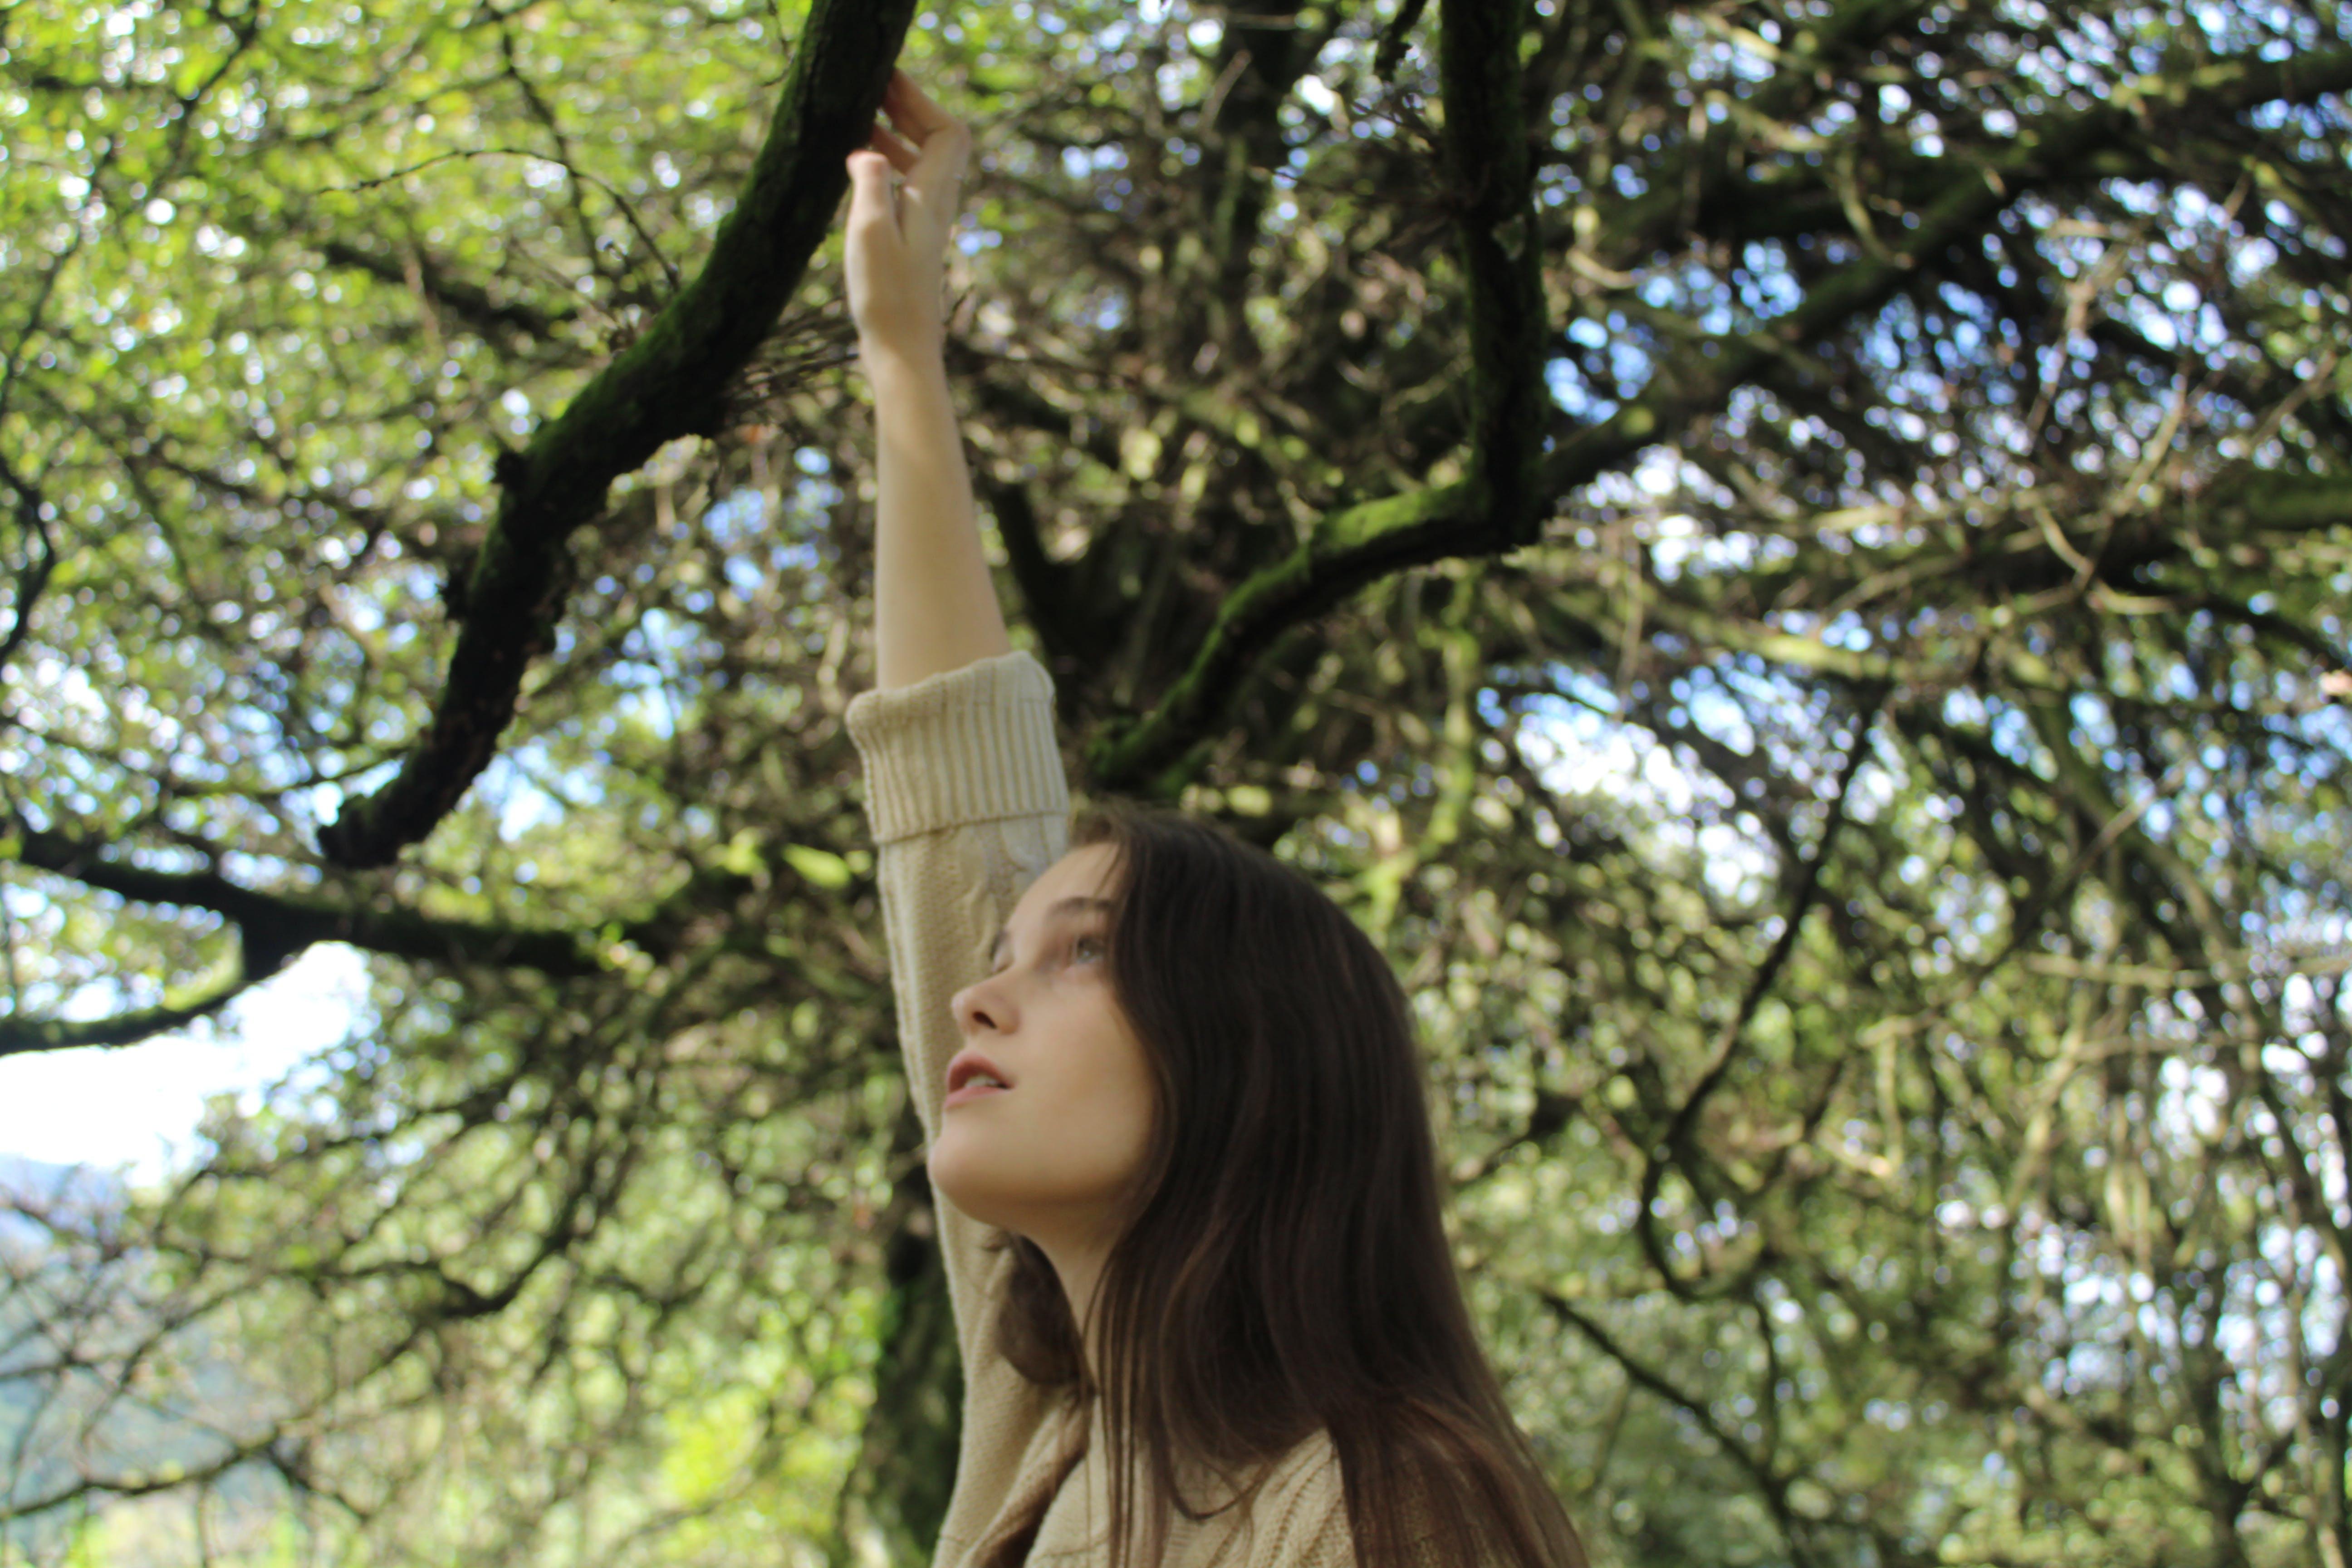 Woman in Brown Half-sleeved Shirt Reaching Black Bare Tree